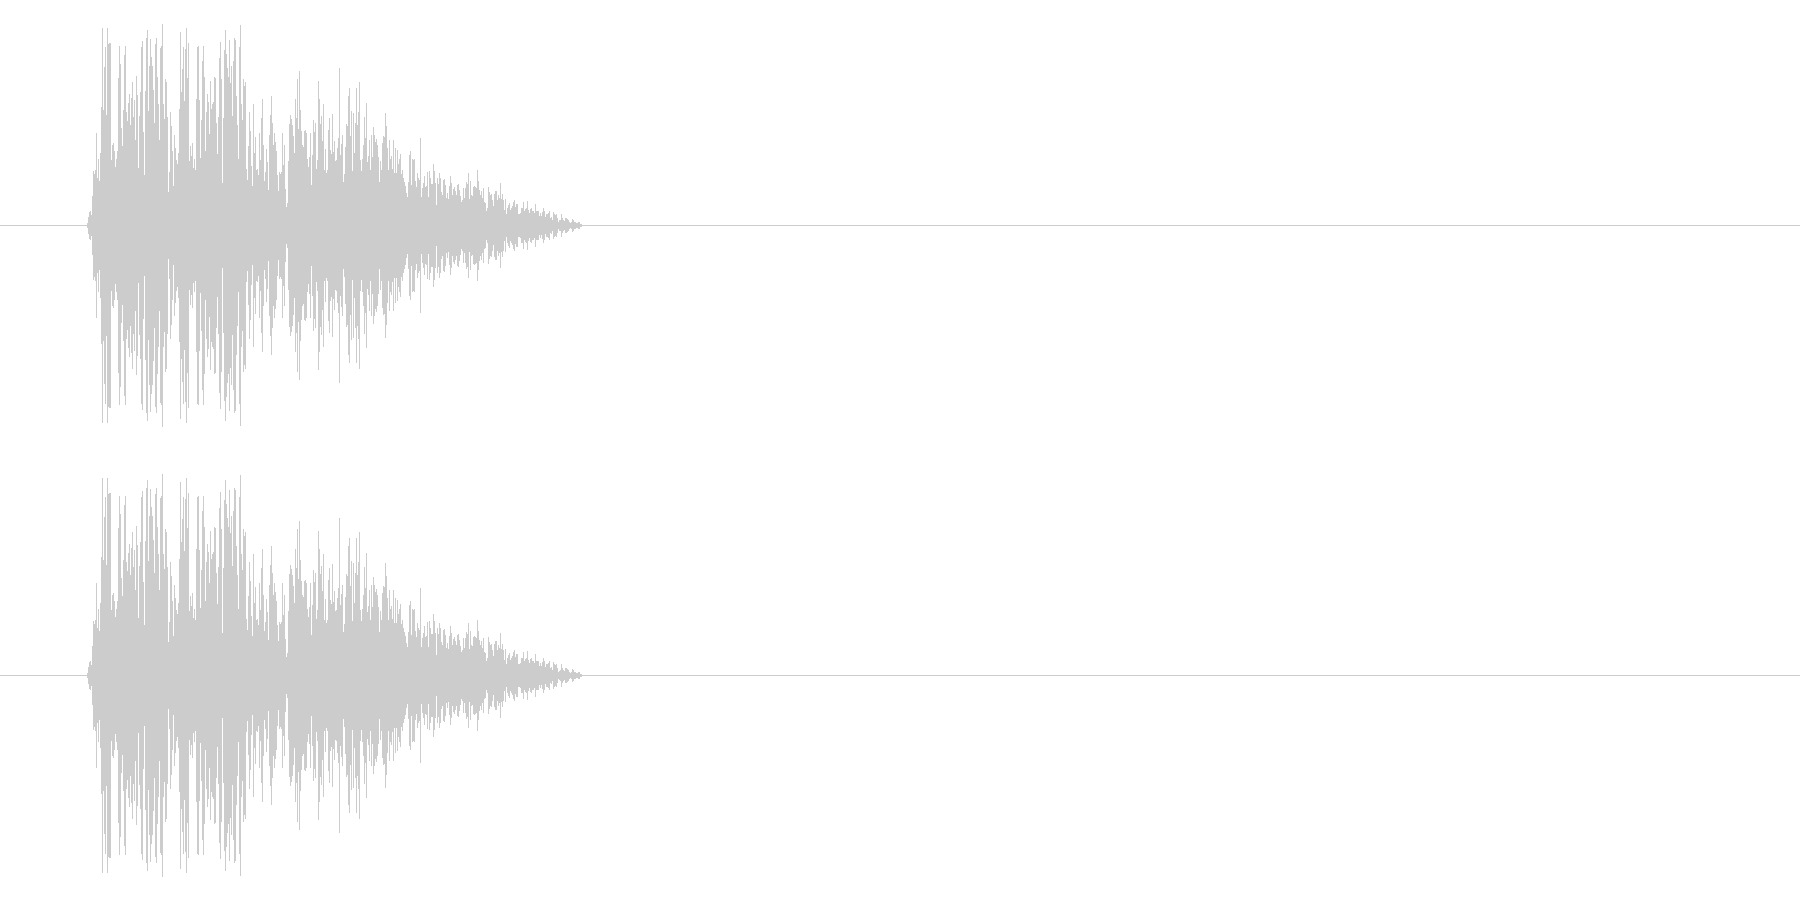 SNES 格闘06-12(倒れる)の未再生の波形